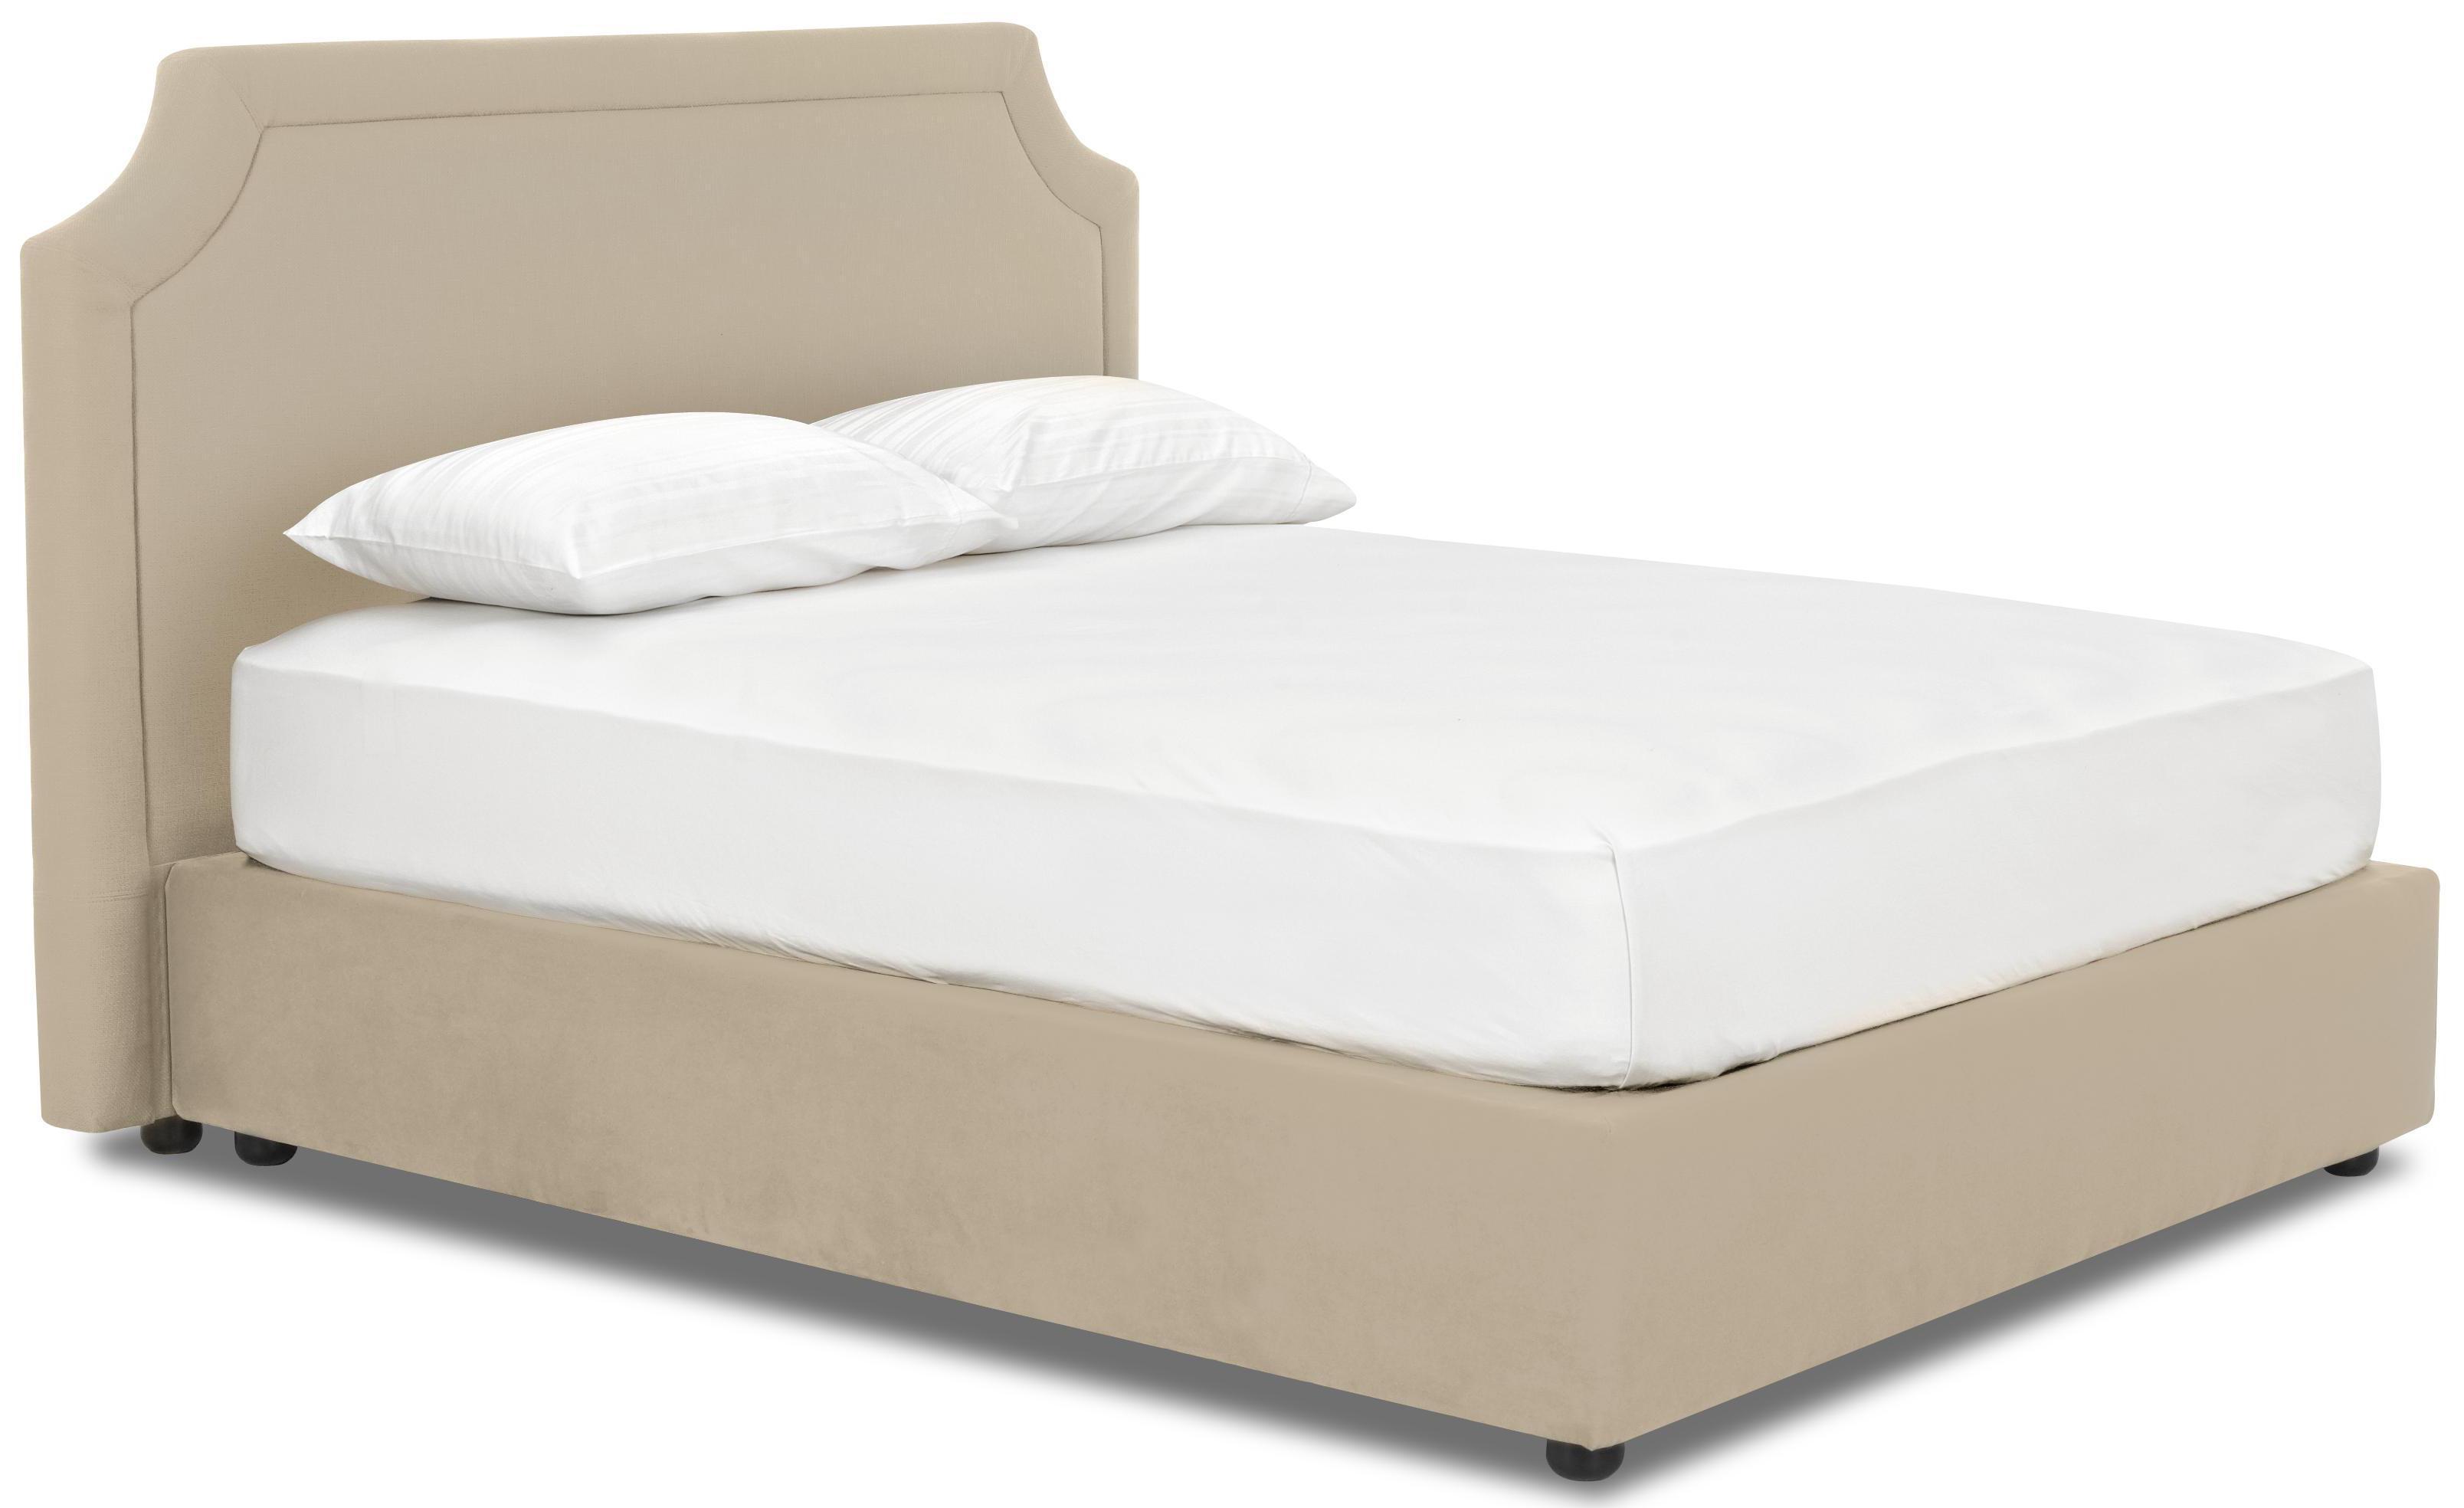 Queen Upholstered Platform Bed By Klaussner